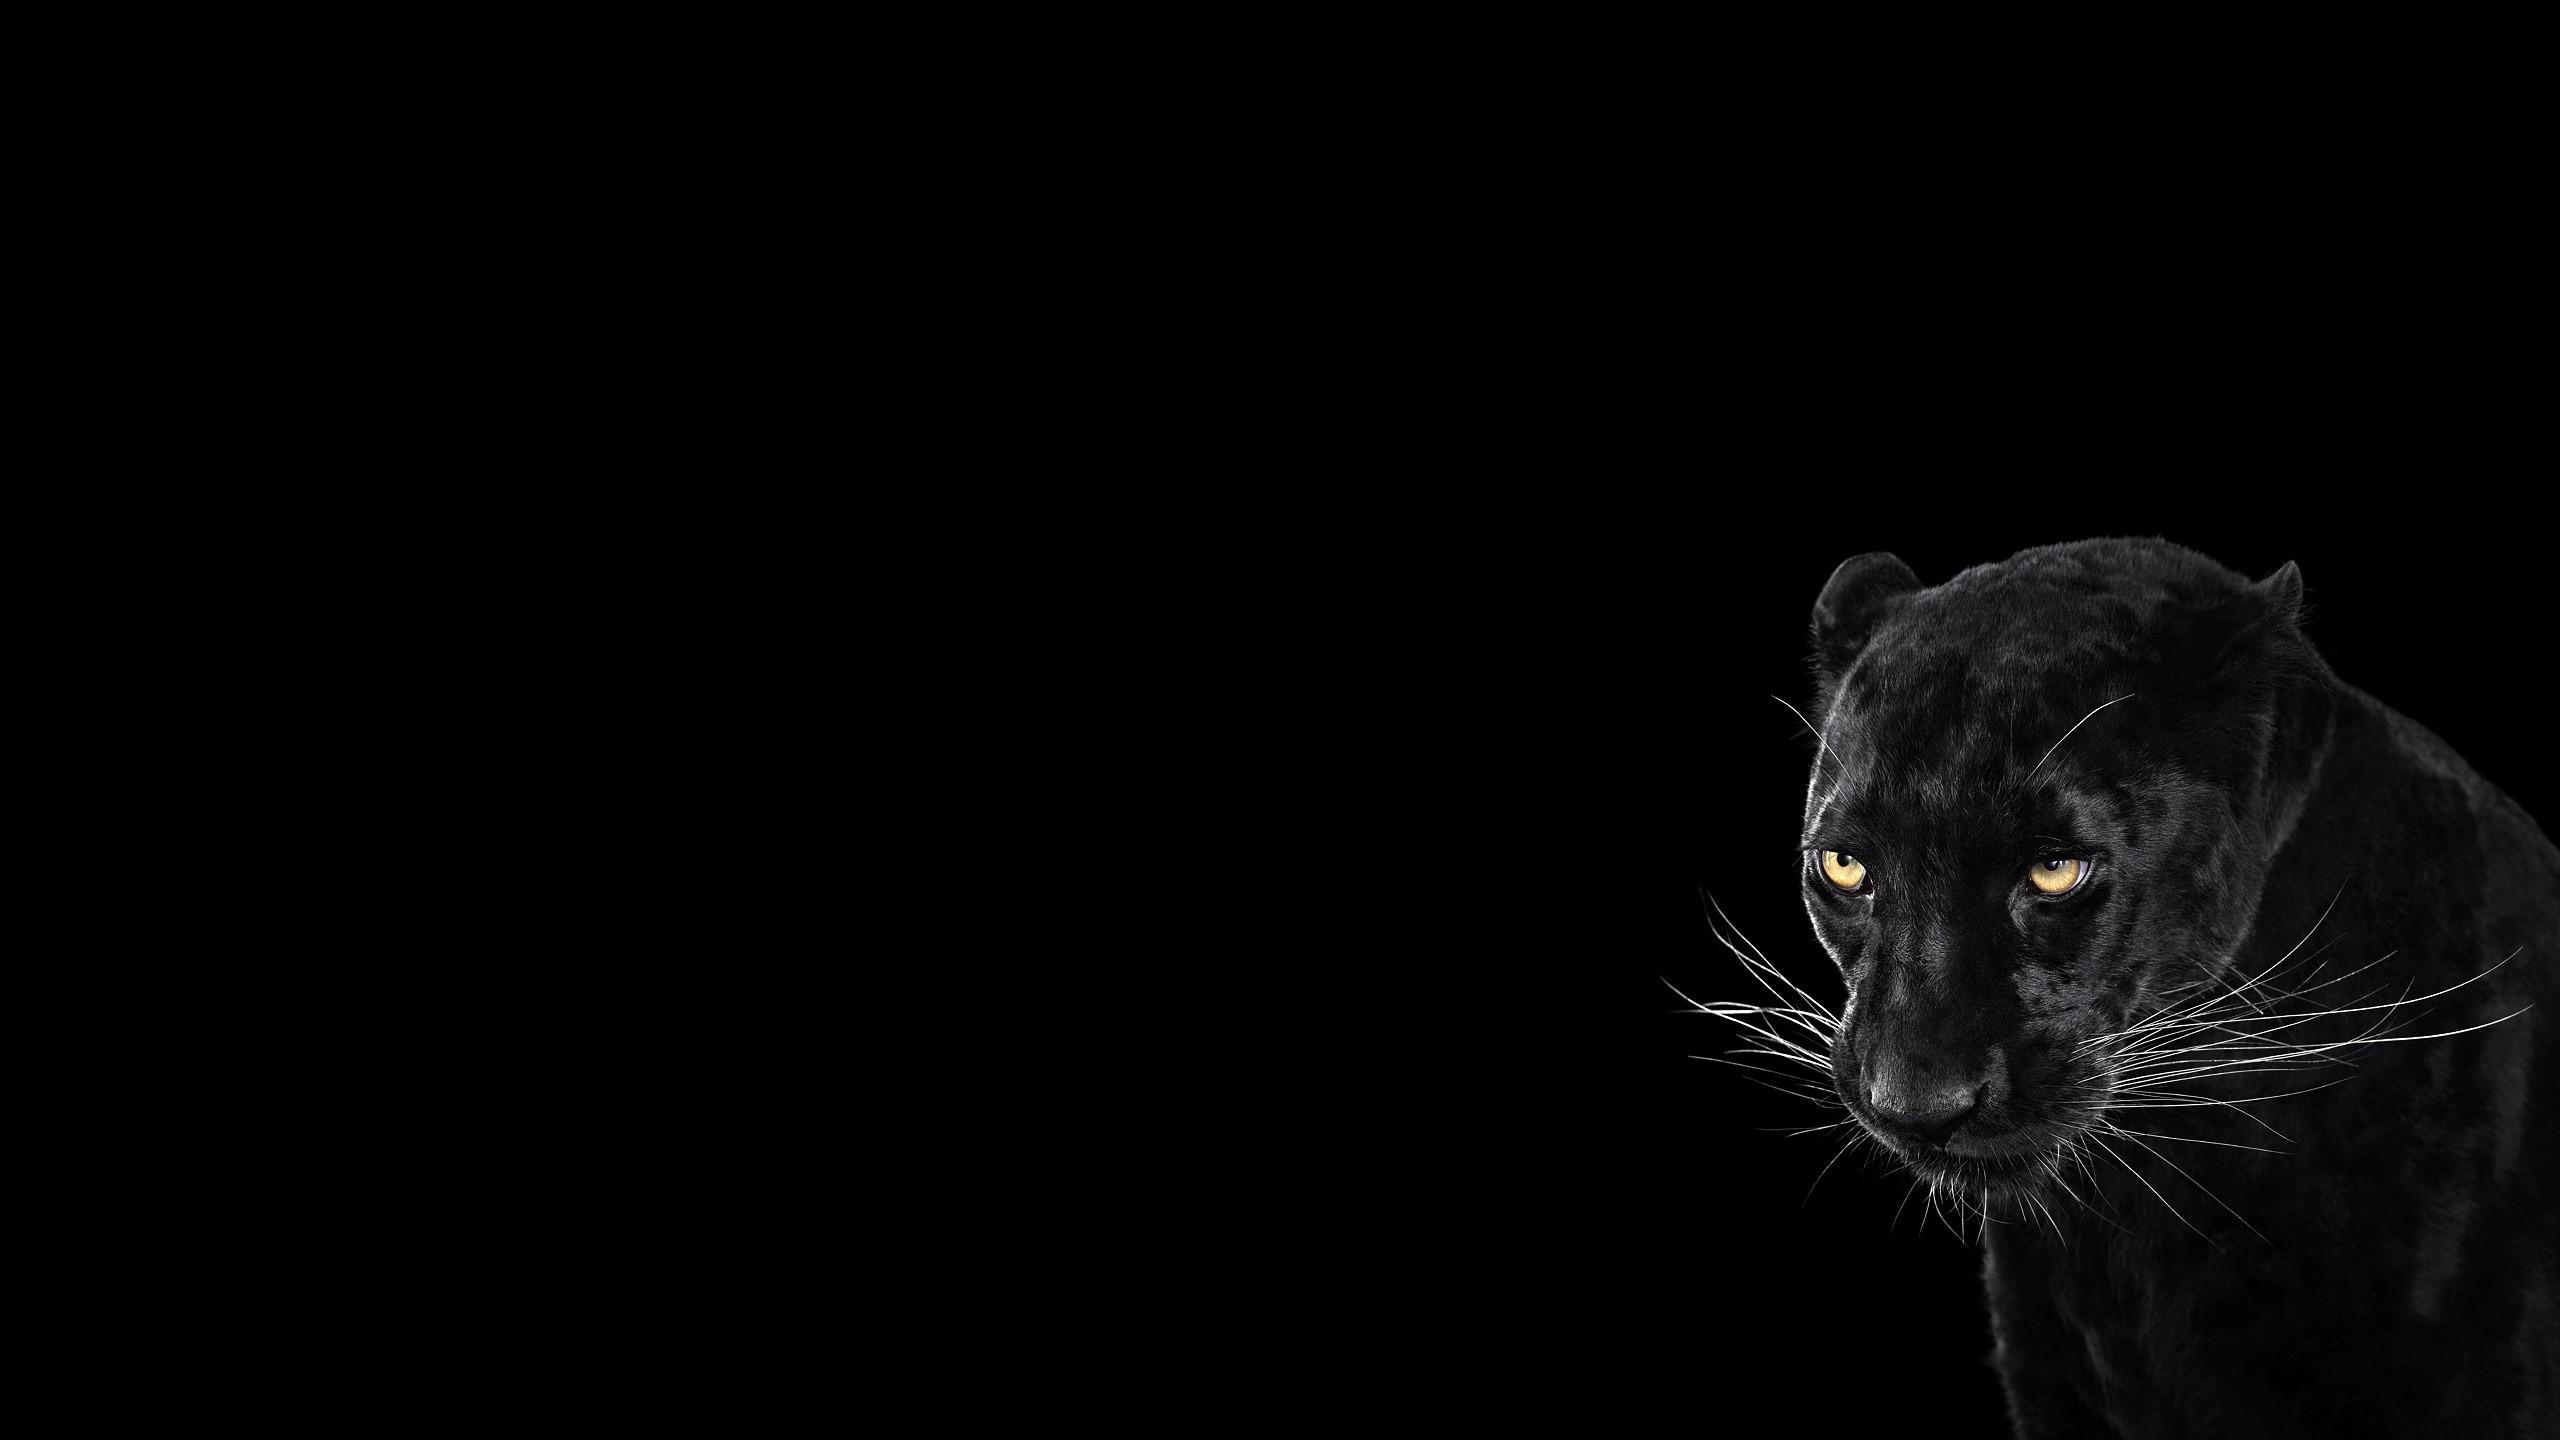 Black Jaguar Wallpaper 82 Images